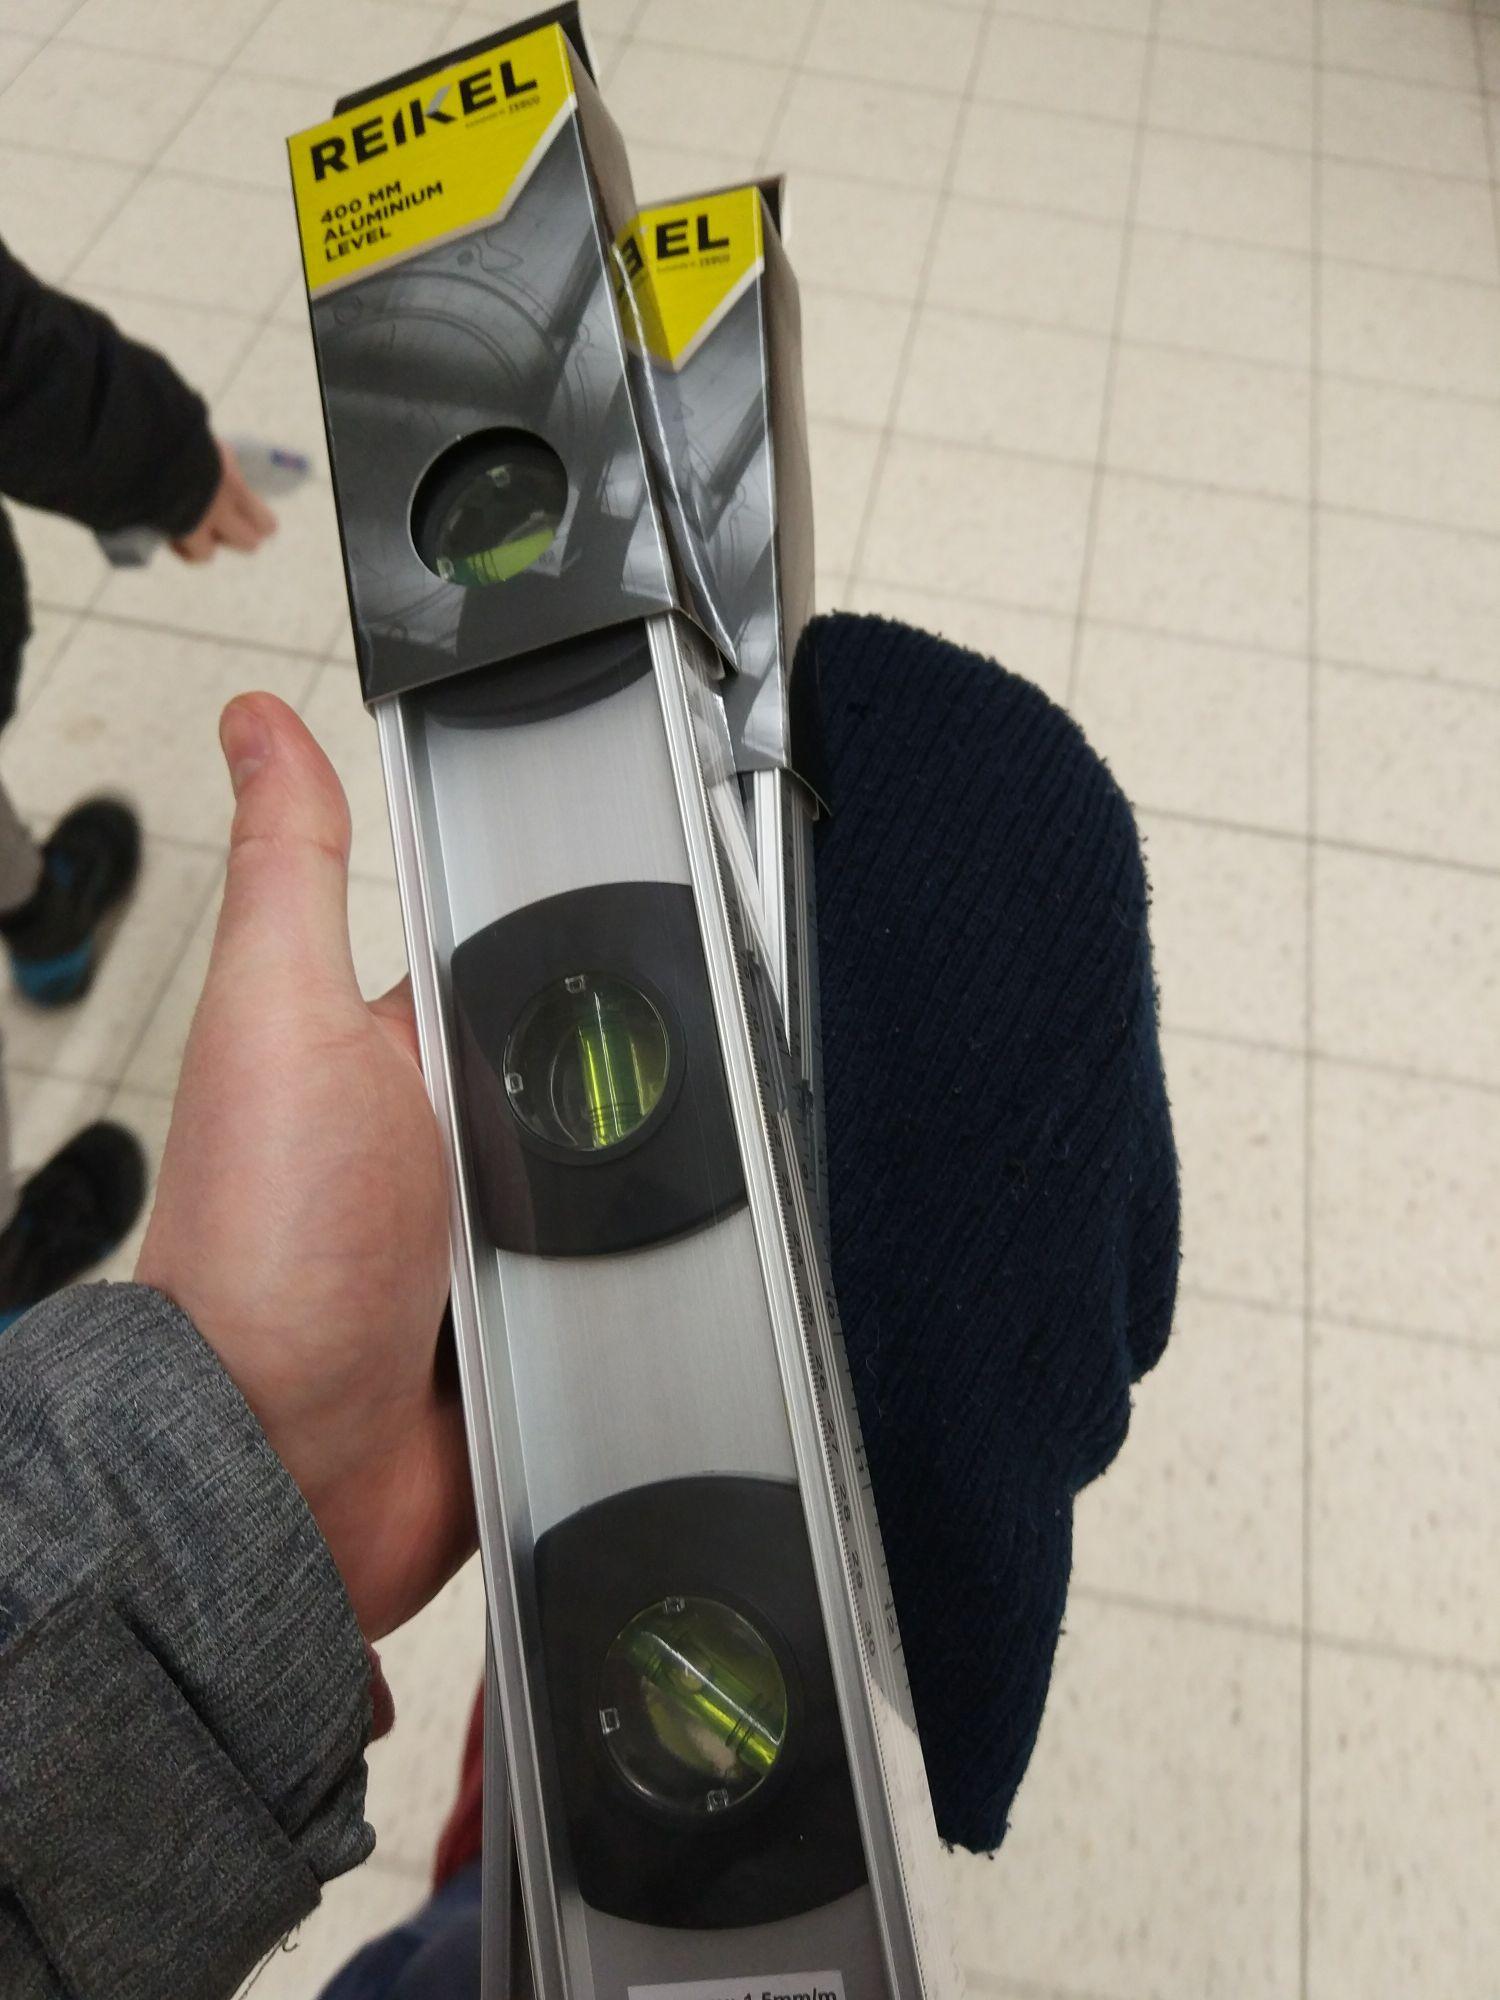 Poziomica 400 mm Tesco Reikel